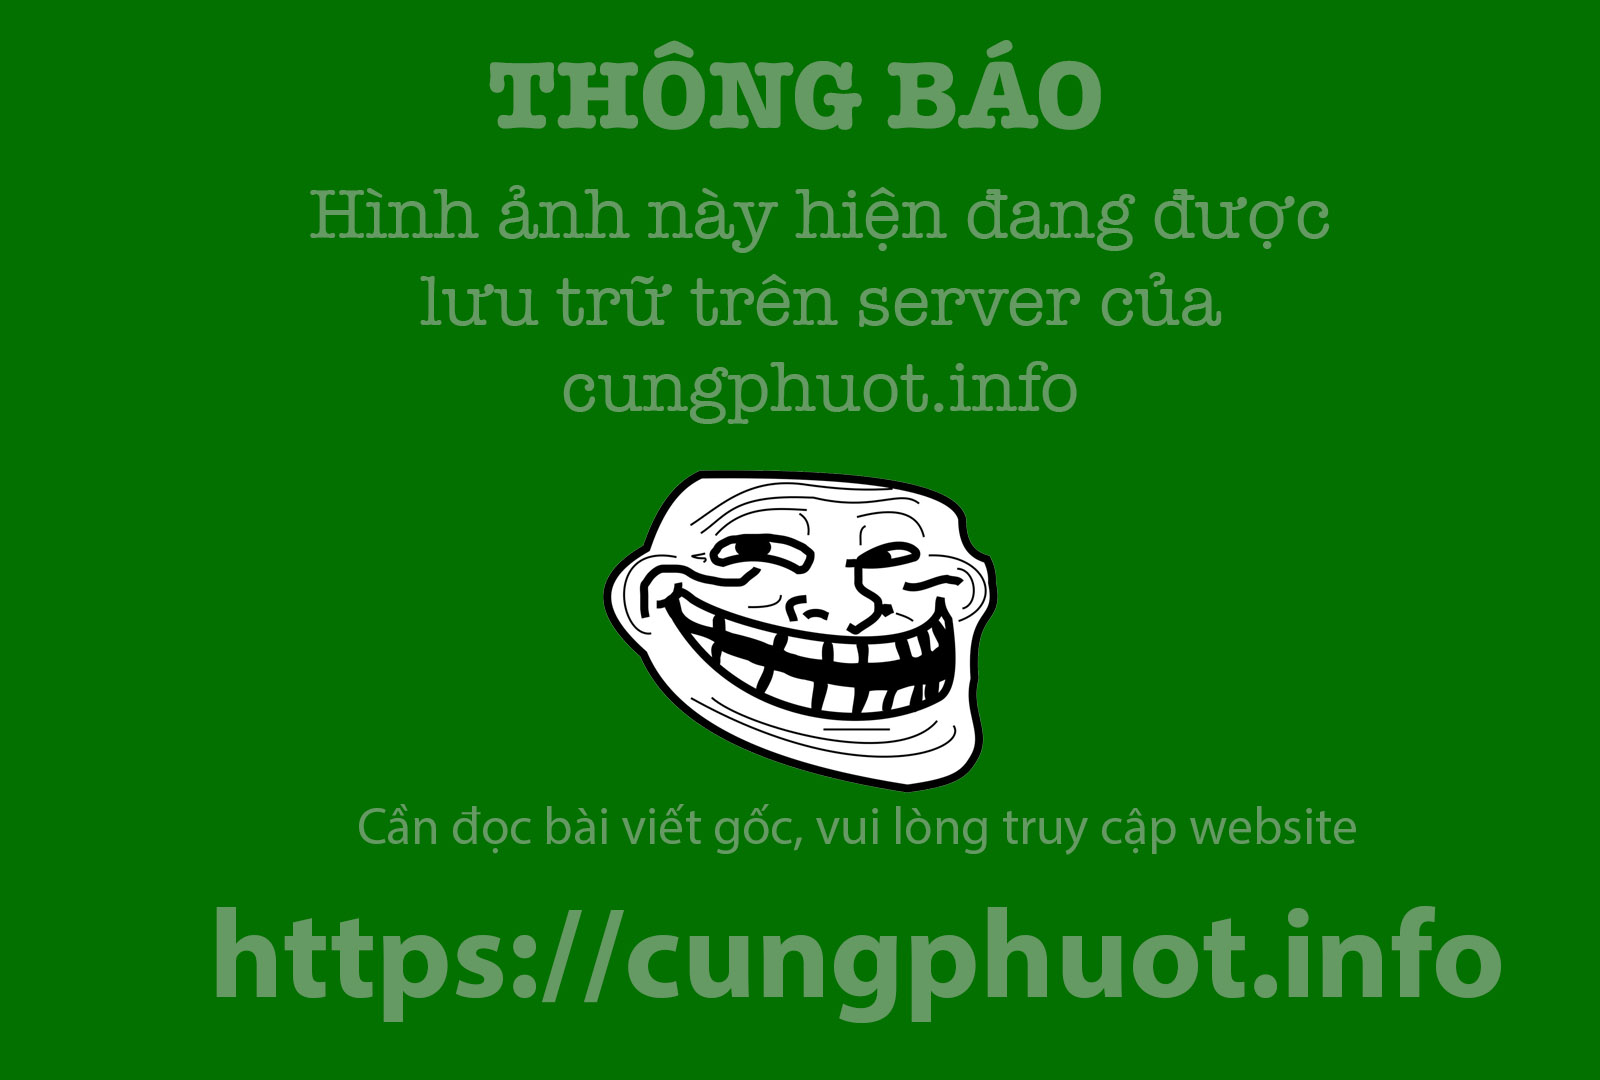 Den Moc Chau san mai anh dao hinh anh 12